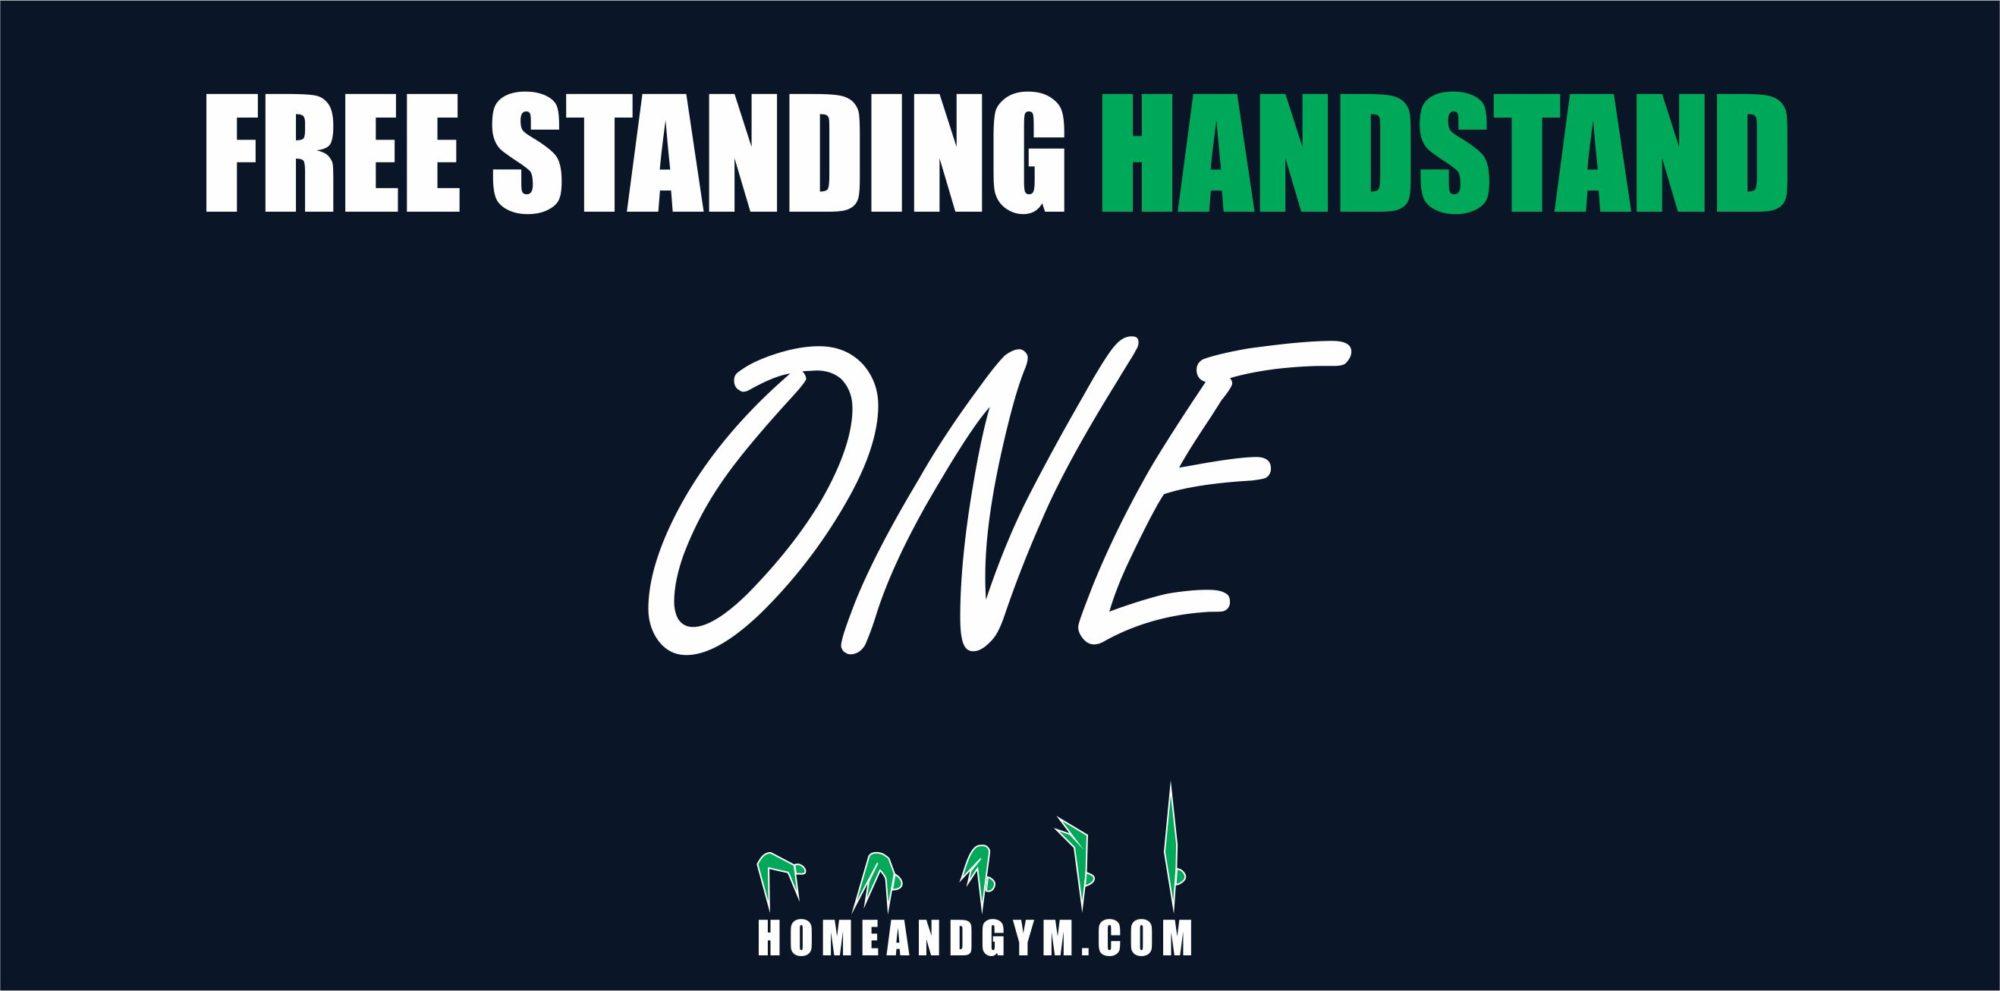 curso parado de manos online